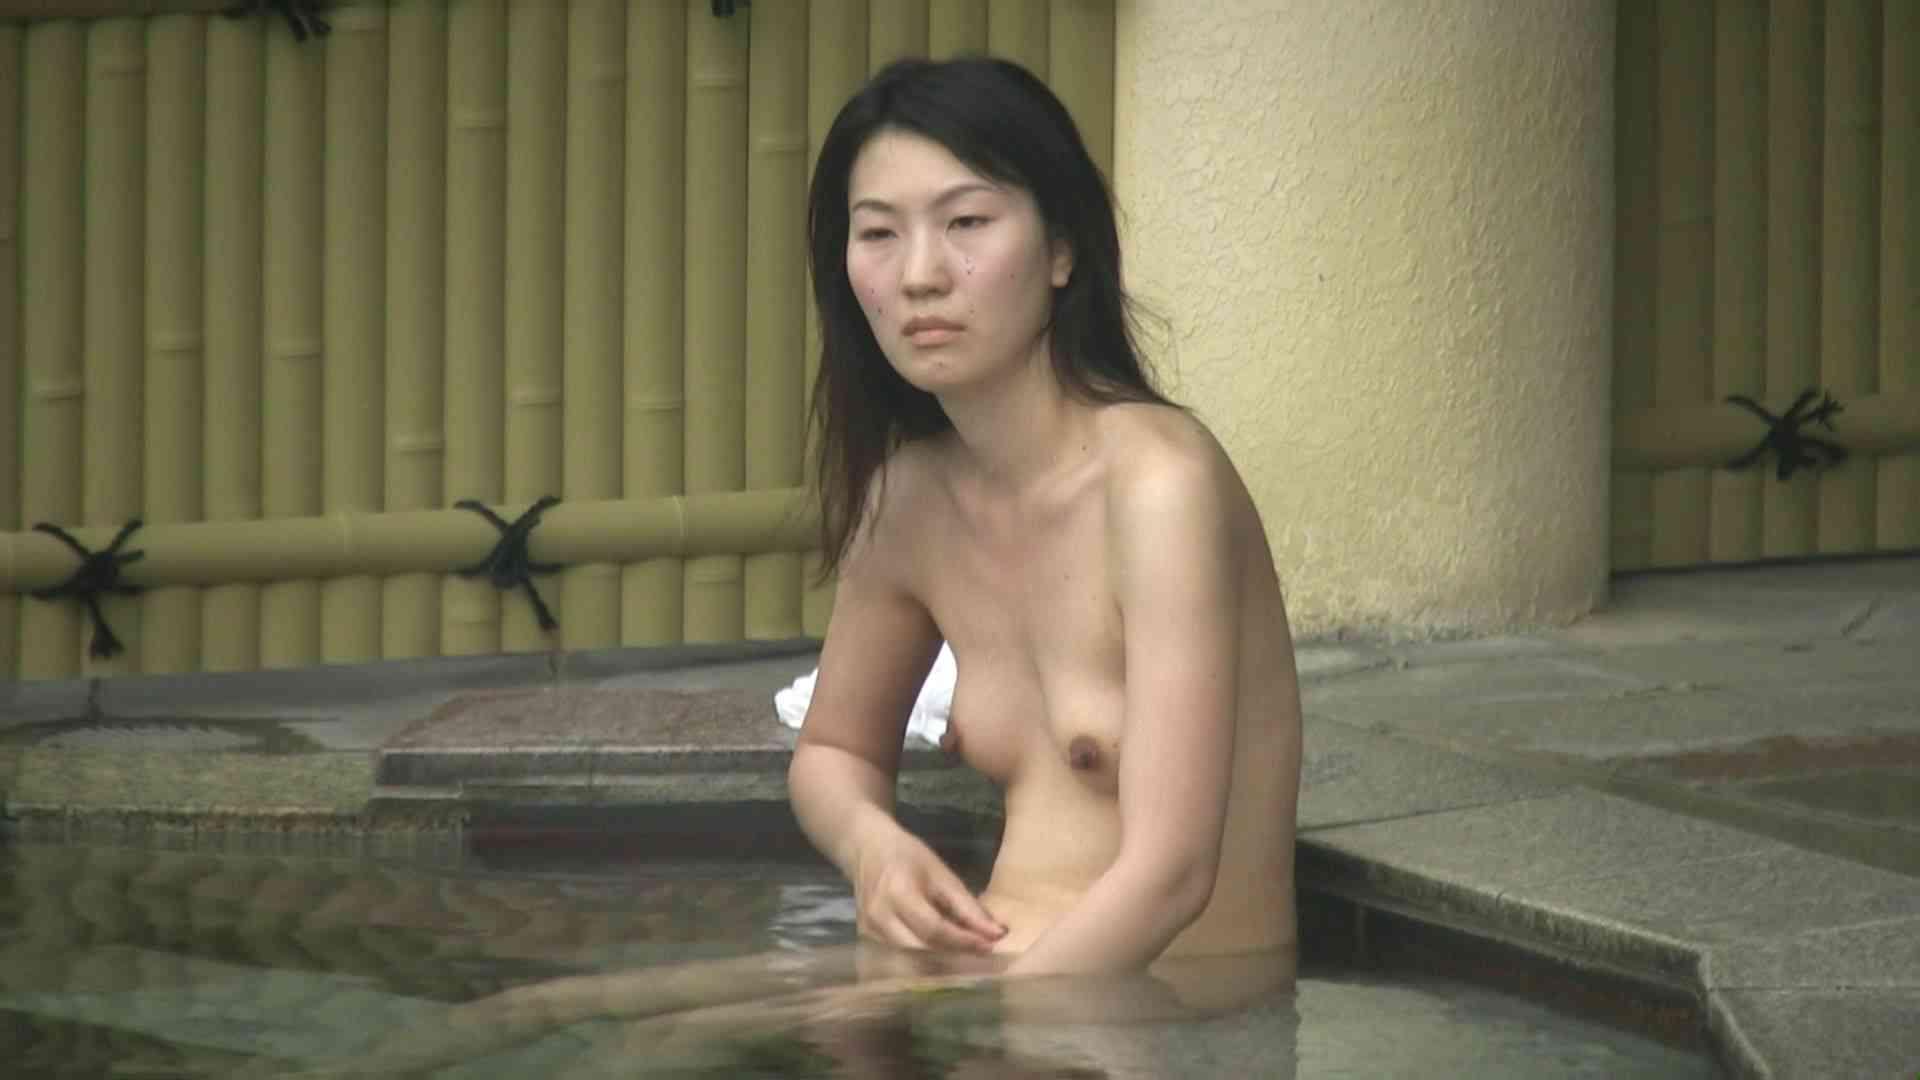 高画質露天女風呂観察 vol.034 望遠映像 AV無料動画キャプチャ 103PIX 101